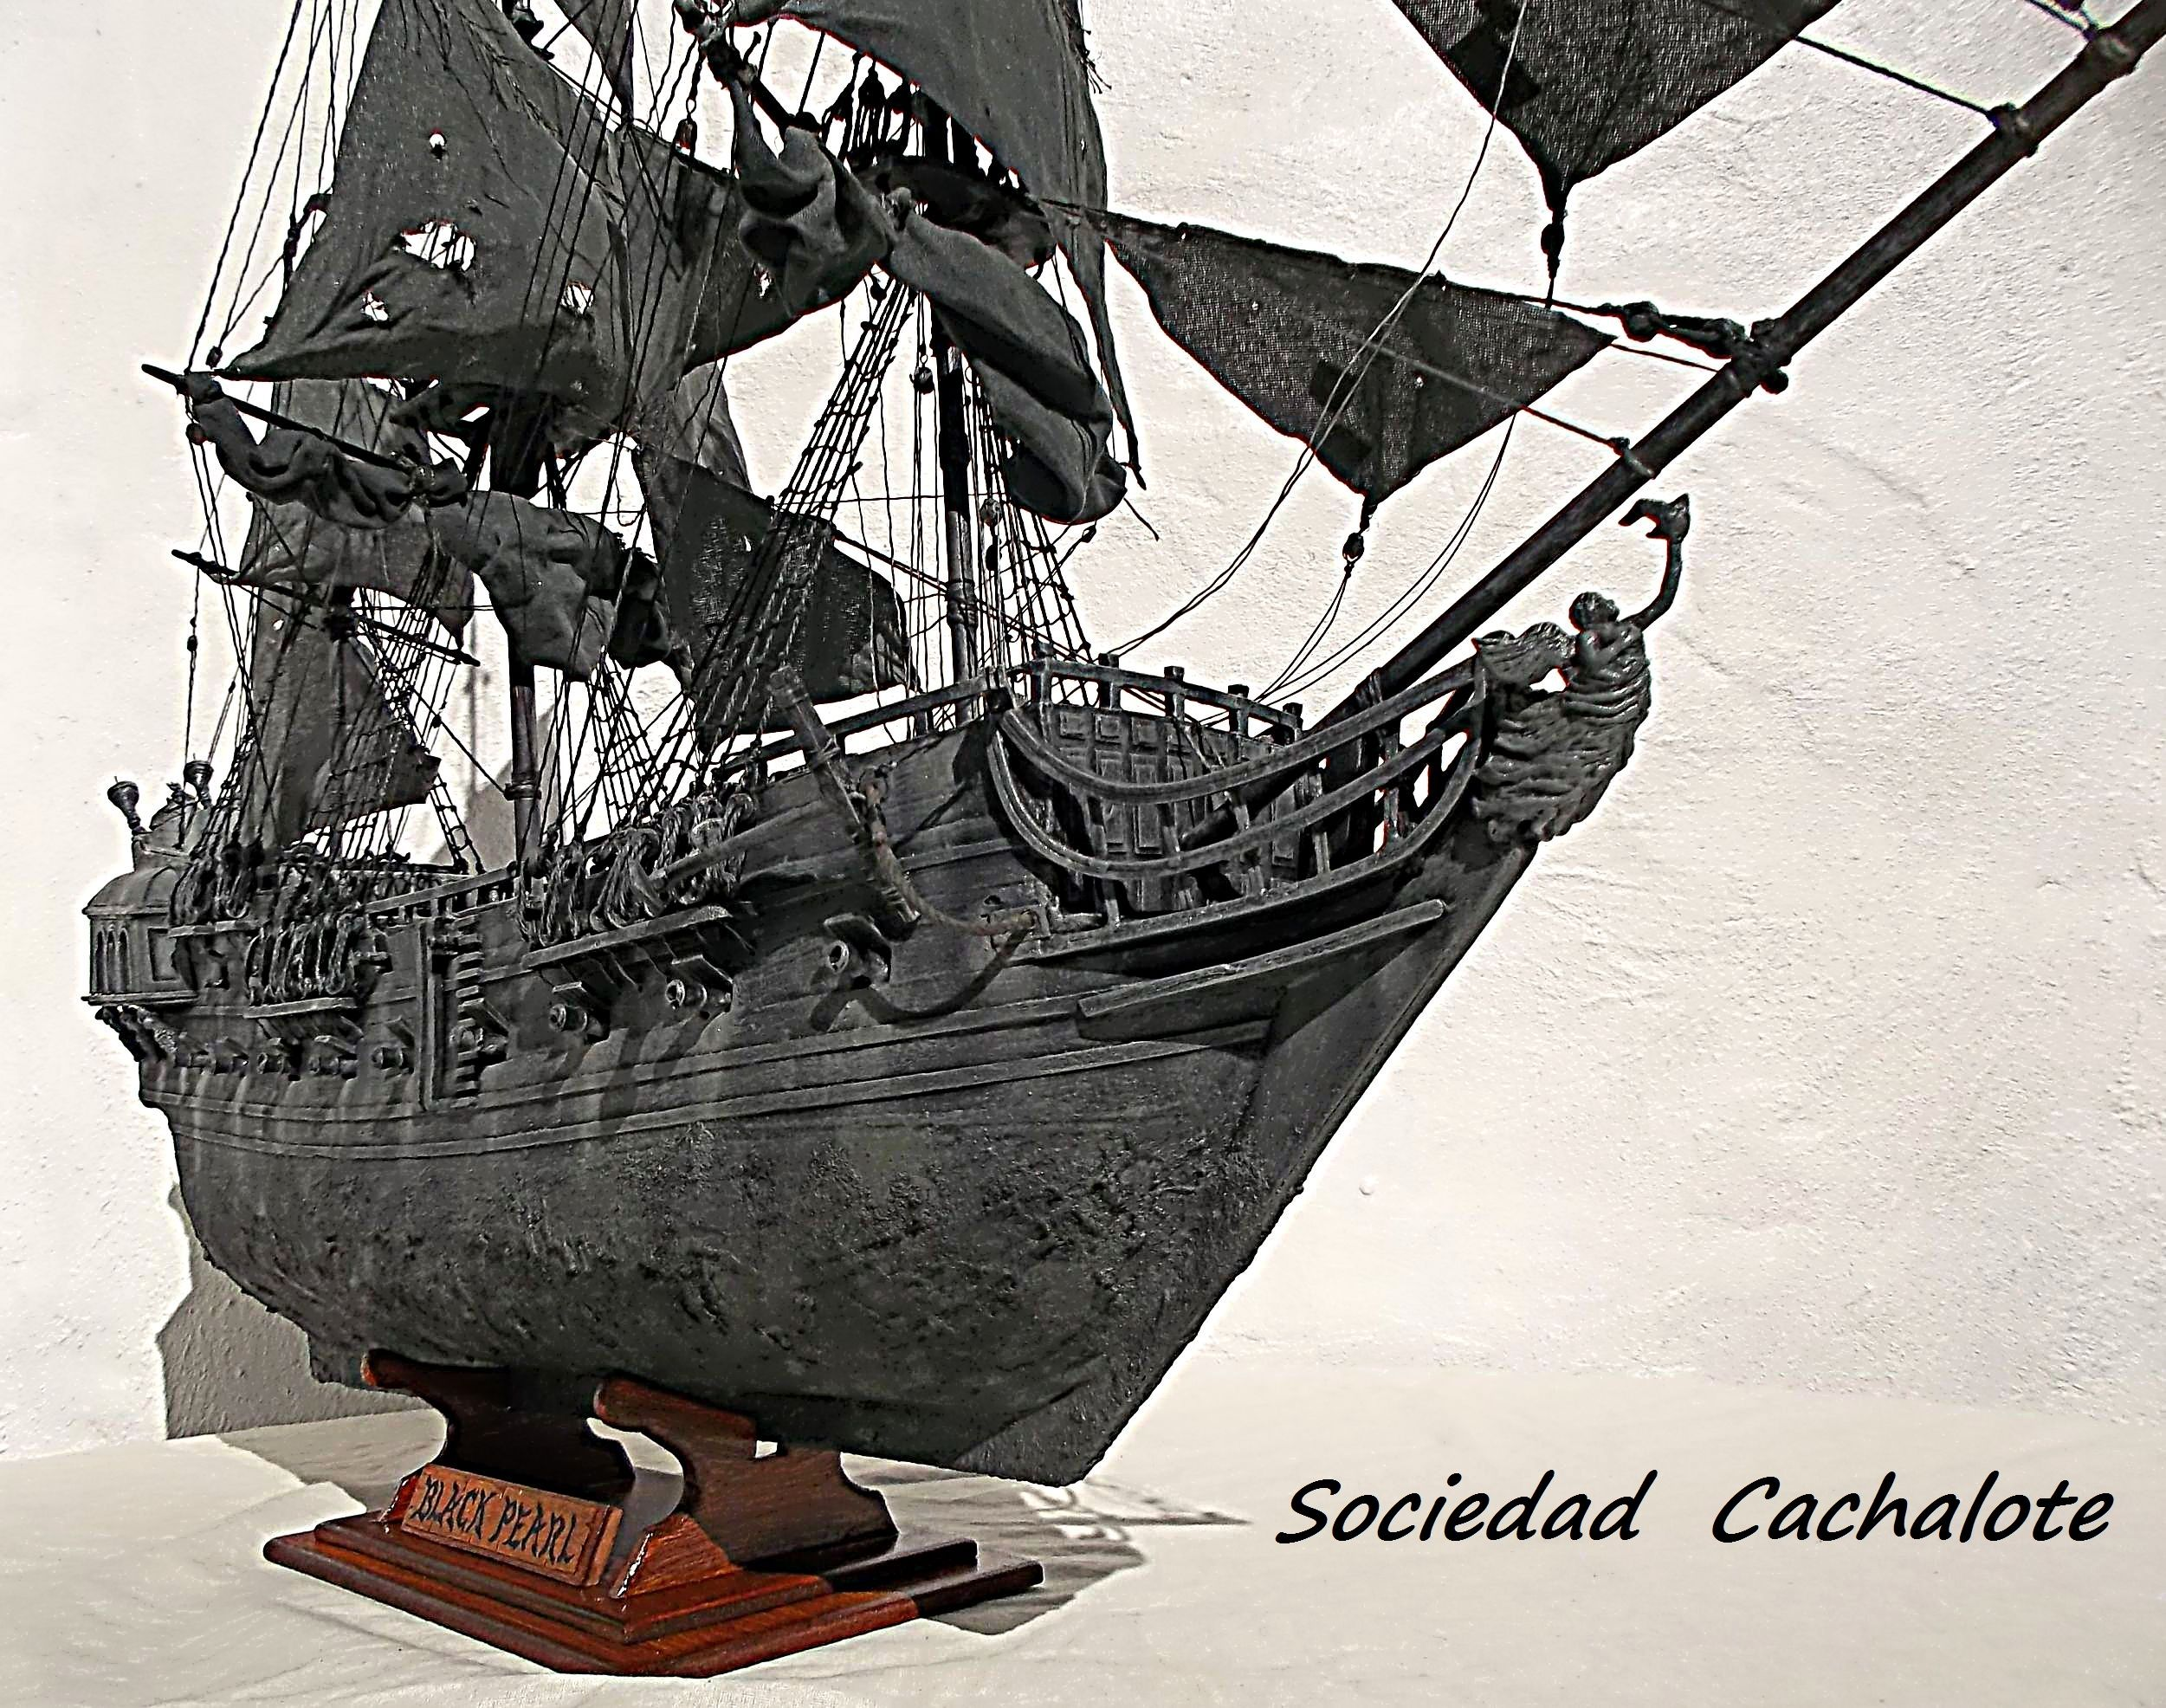 Perla Negra Sociedad Cachalote Boat Sailing Ships Black Pearl